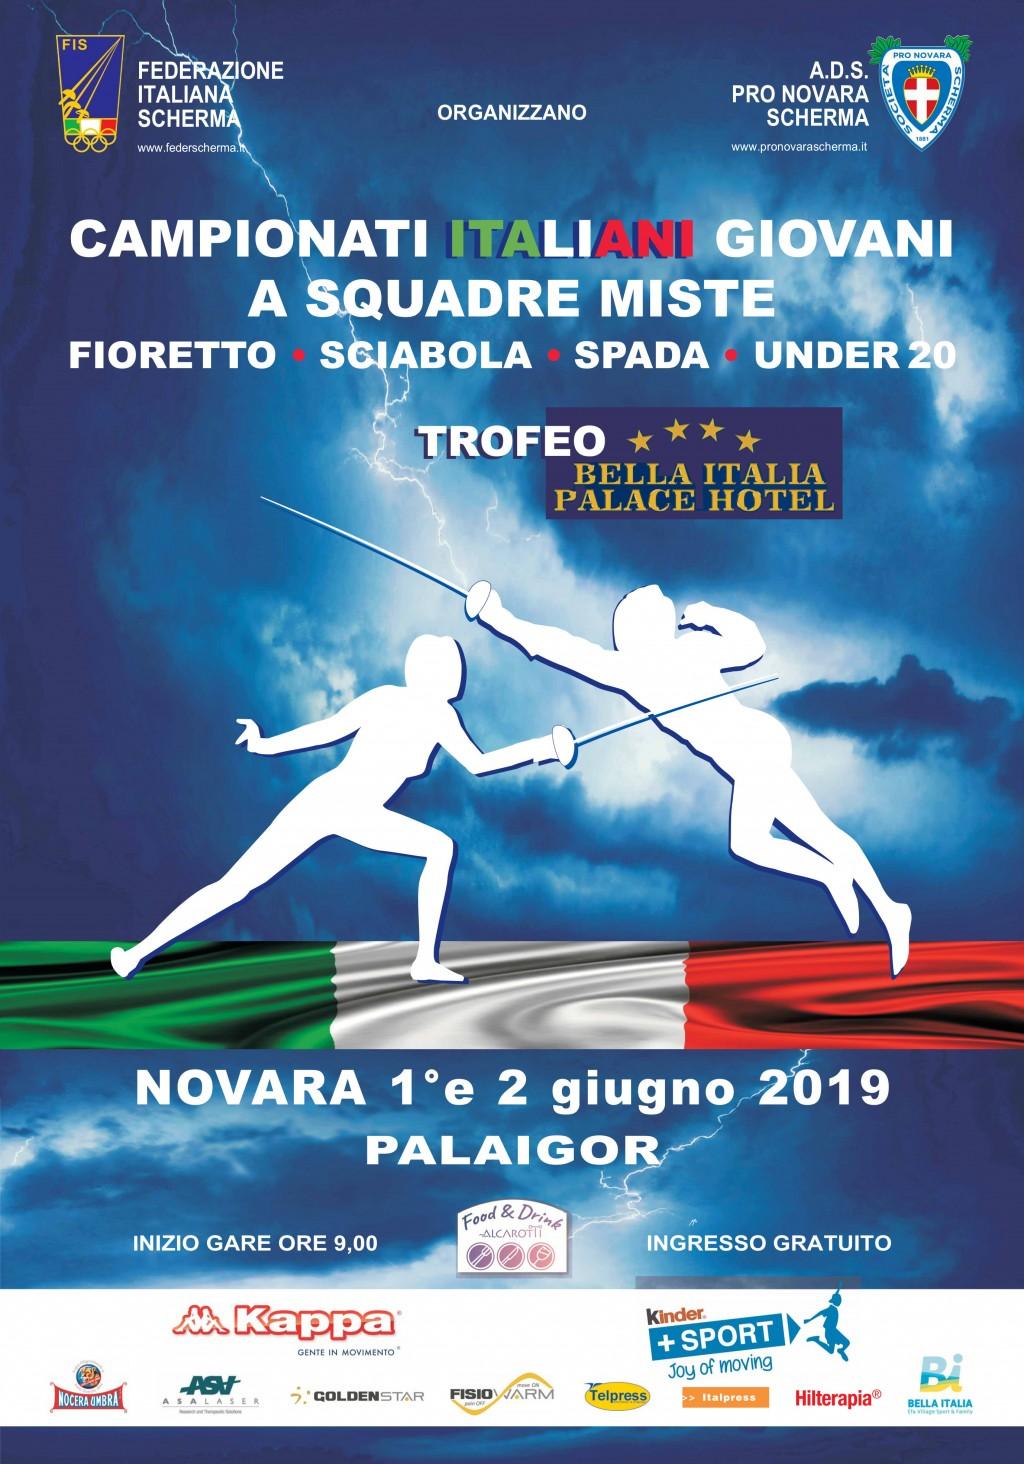 CAMPIONATI ITALIANI GIOVANI A SQUADRE MISTE- PALAIGOR NOVARA 1°e 2 GIUGNO 2019